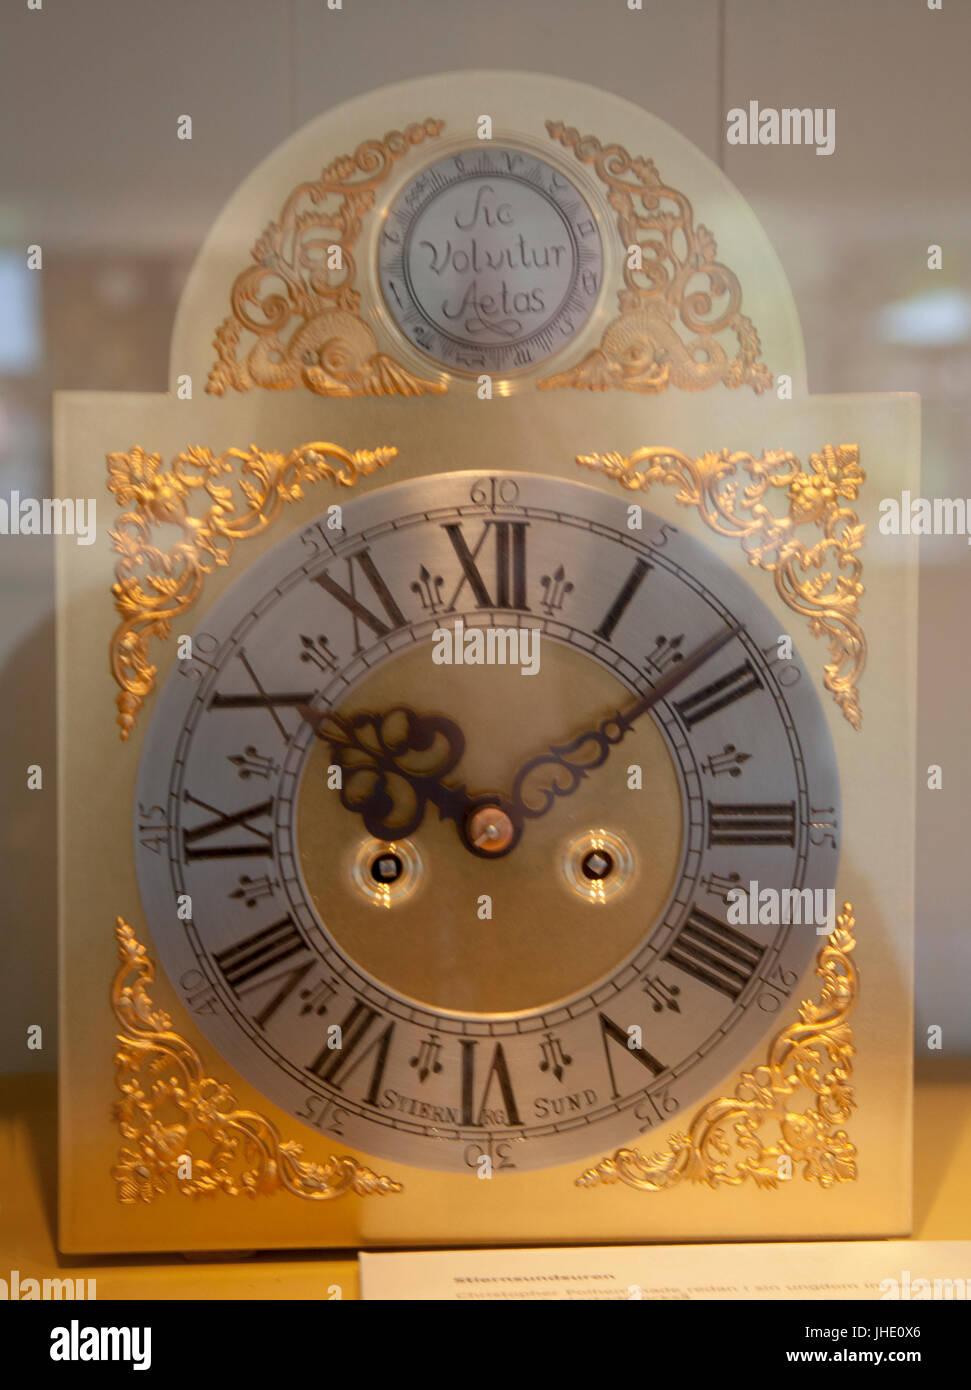 STJÄRNSUND CLOCKS is still produced according to Christopher Polhems design from 1700s - Stock Image